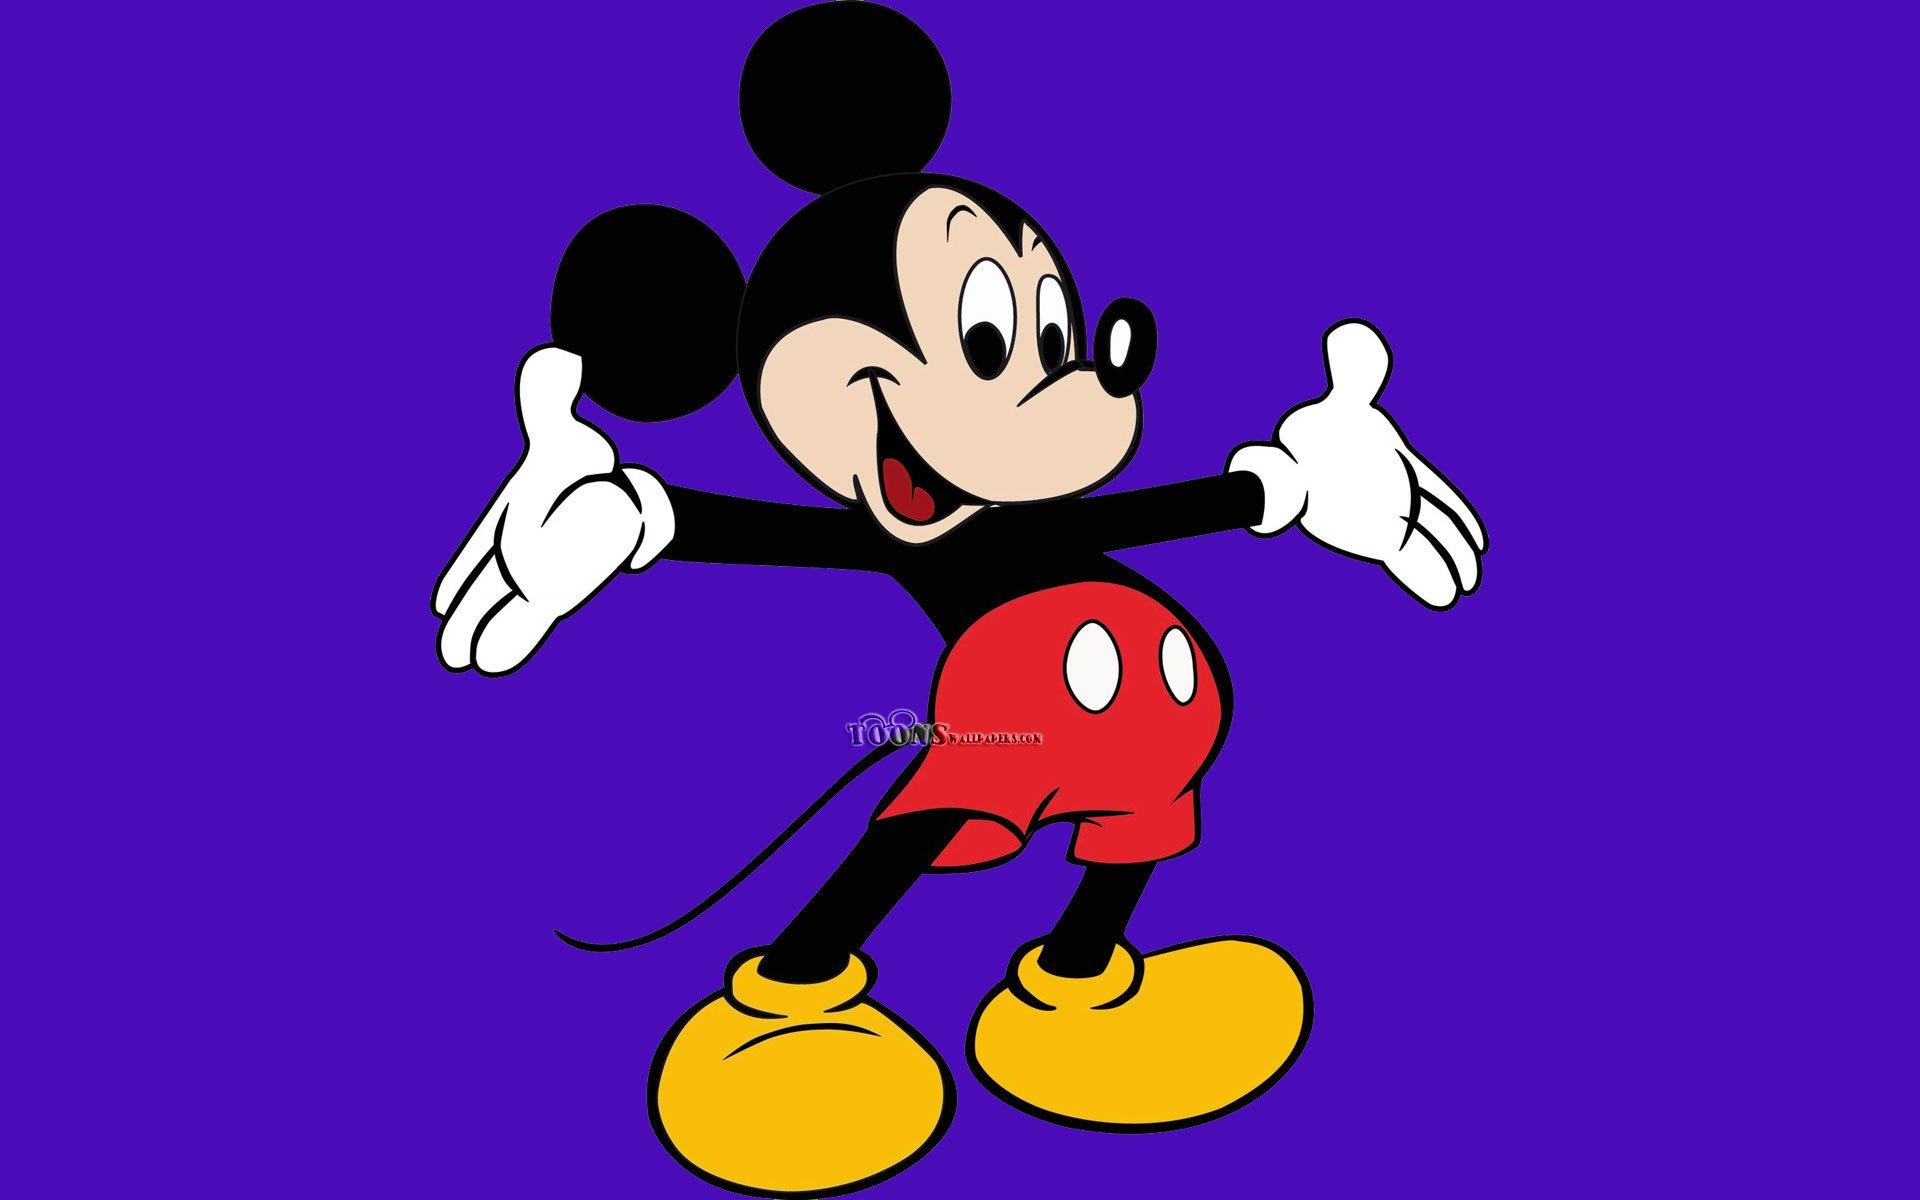 Cute Rat Wallpaper Hd 1366x768 Mickey Mouse Full Hd Fond D 233 Cran And Arri 232 Re Plan